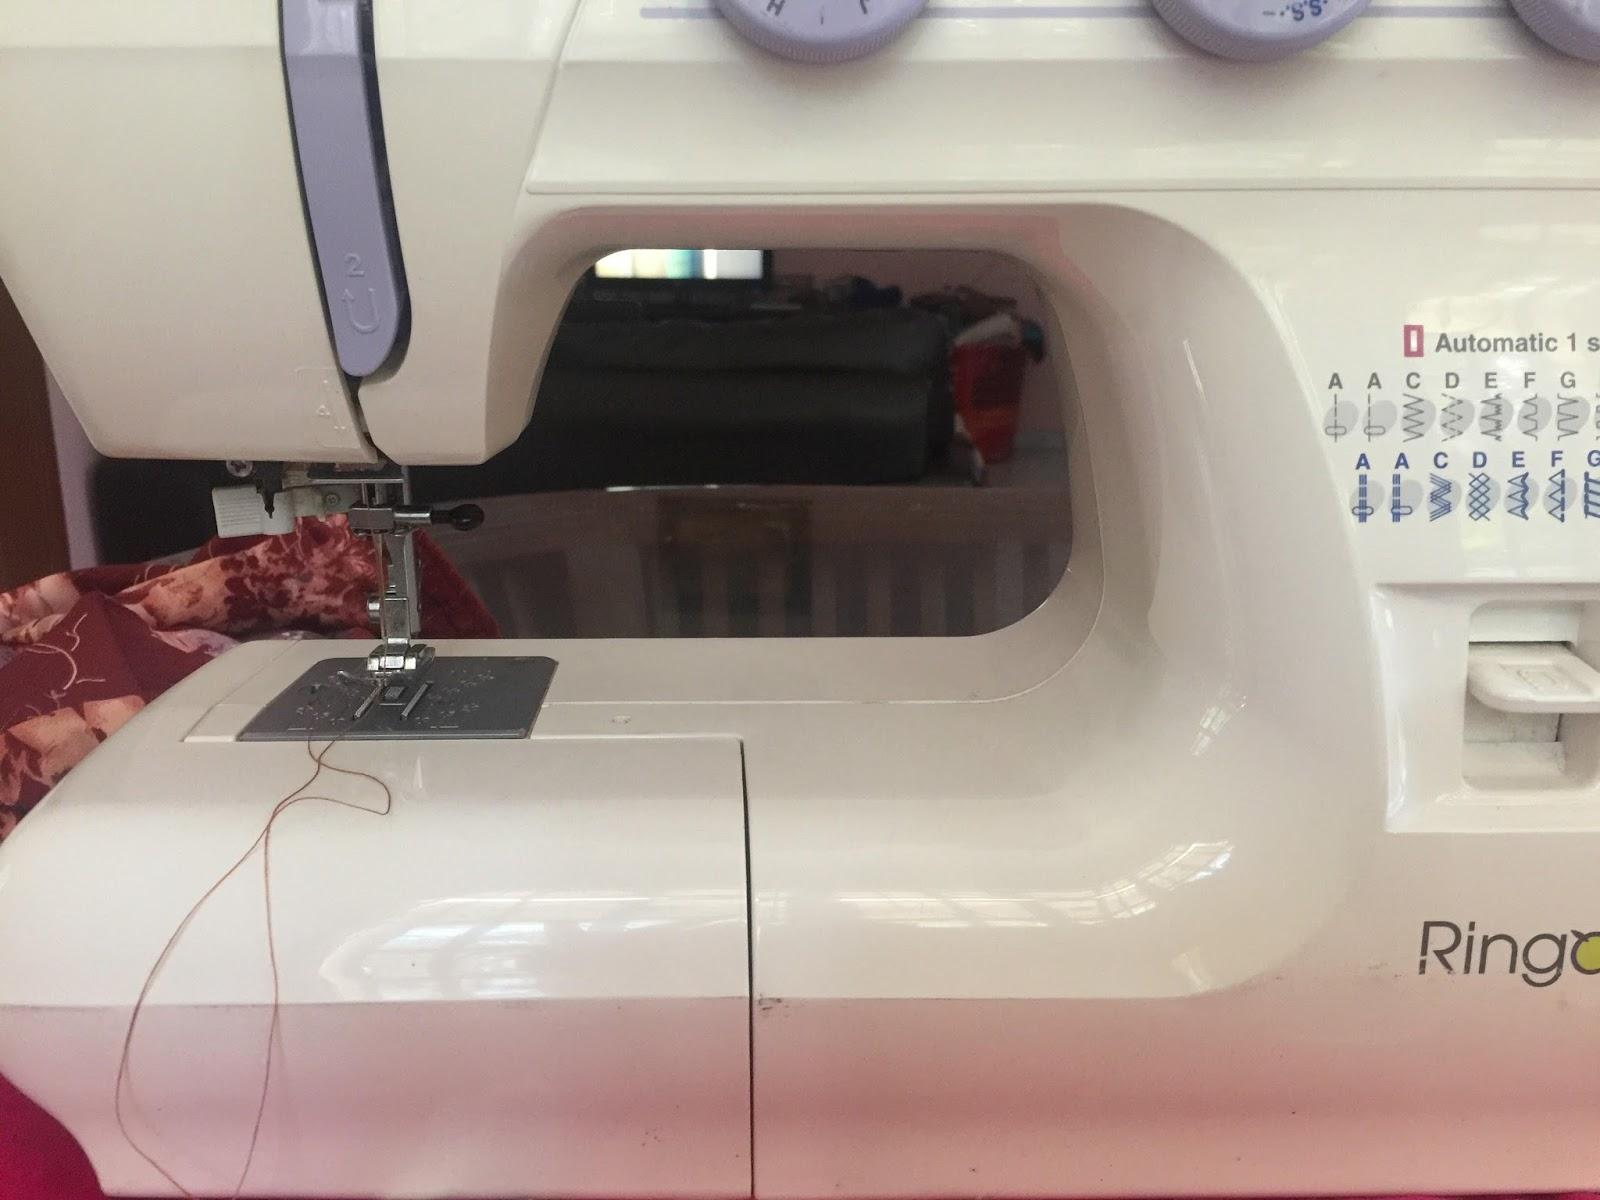 jahitan, jahit baju sendiri, mesin jahit mudah guna, baju kurung